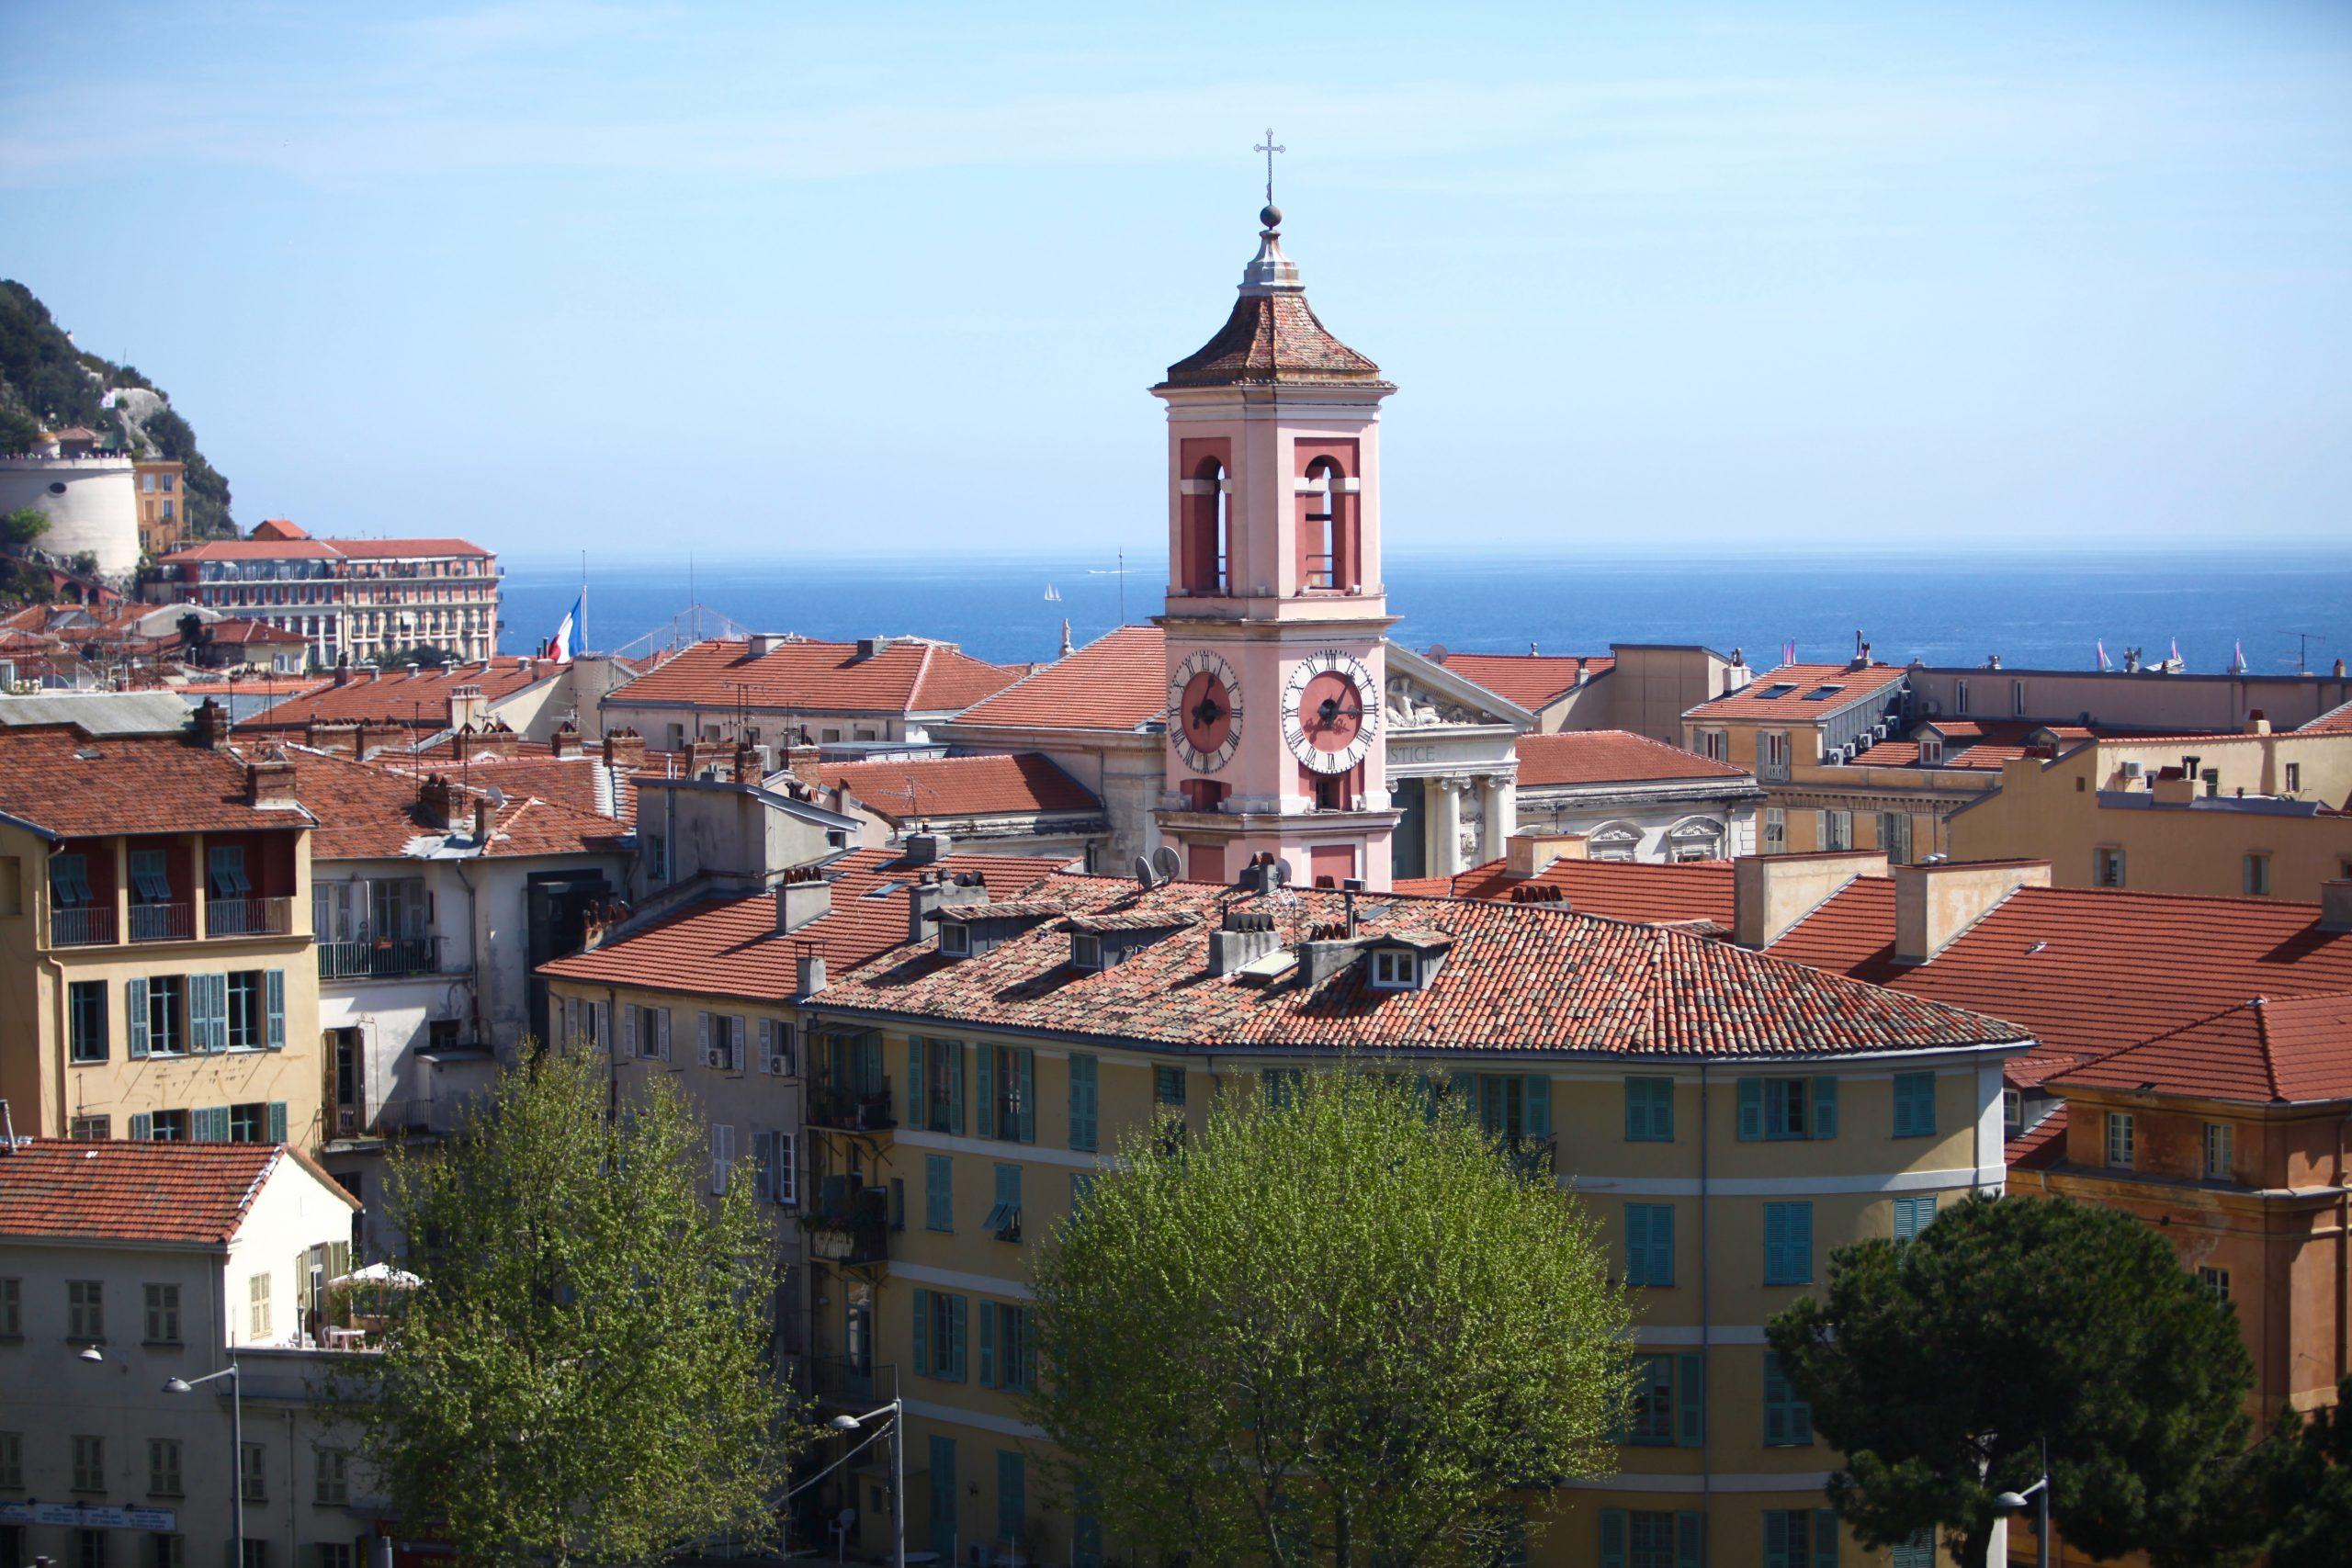 Toits du Vieux Nice